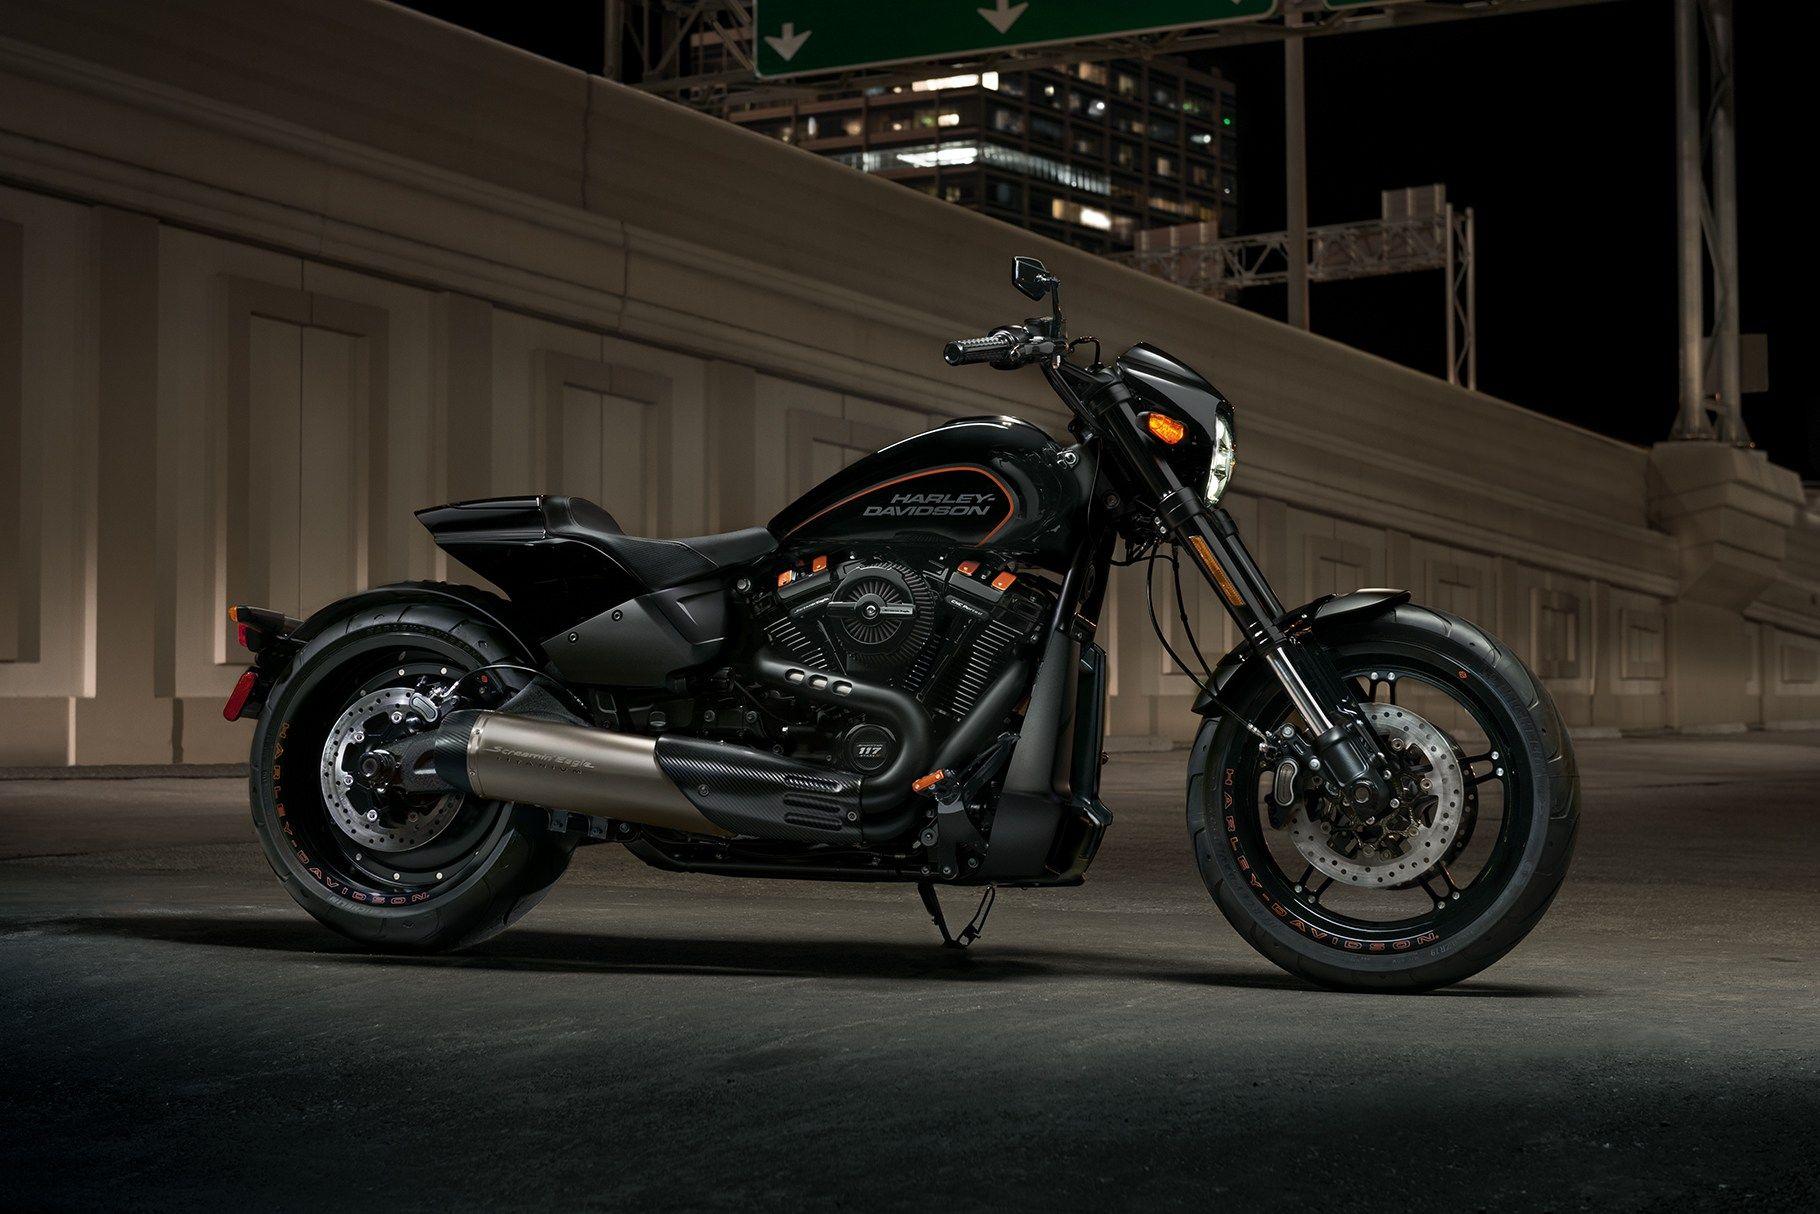 Fxdr 114 | bikes | Classic harley davidson, Harley davidson